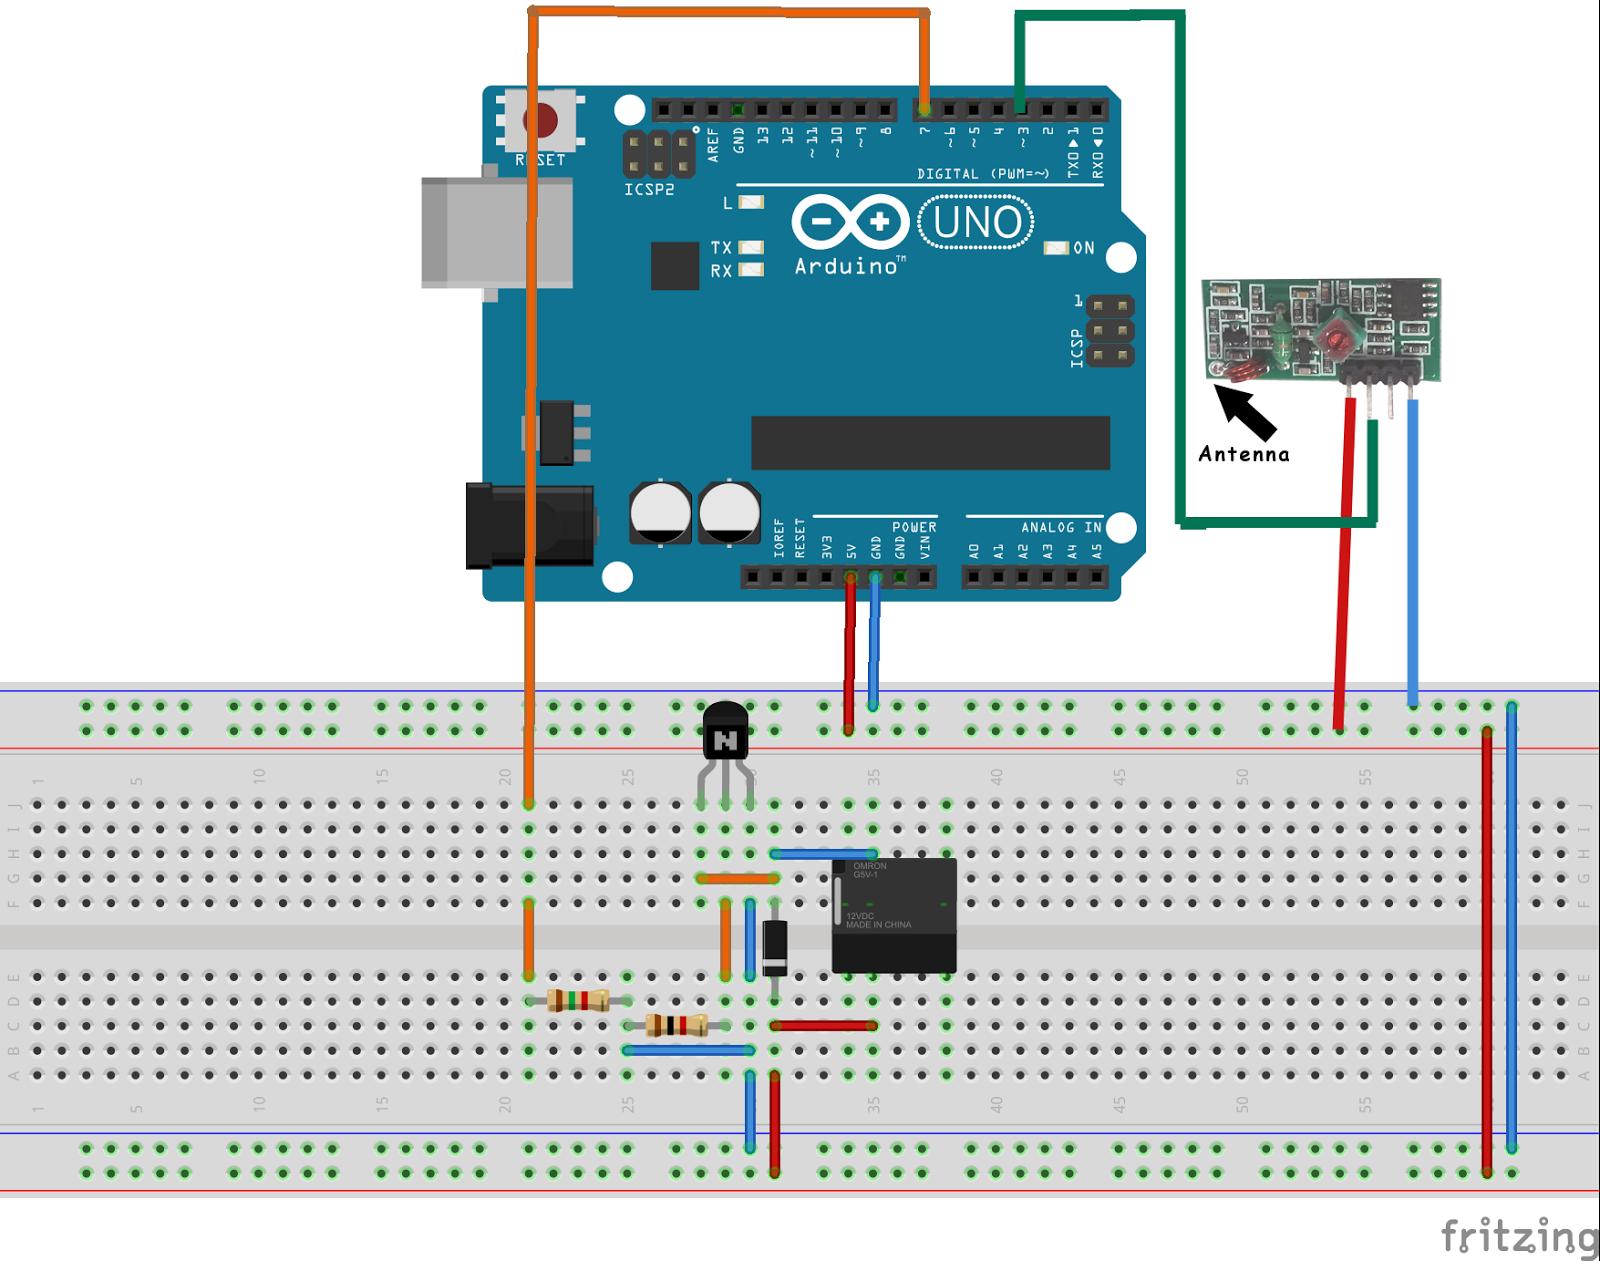 Schemi Elettrici Arduino : Etabeta studio makers per passione